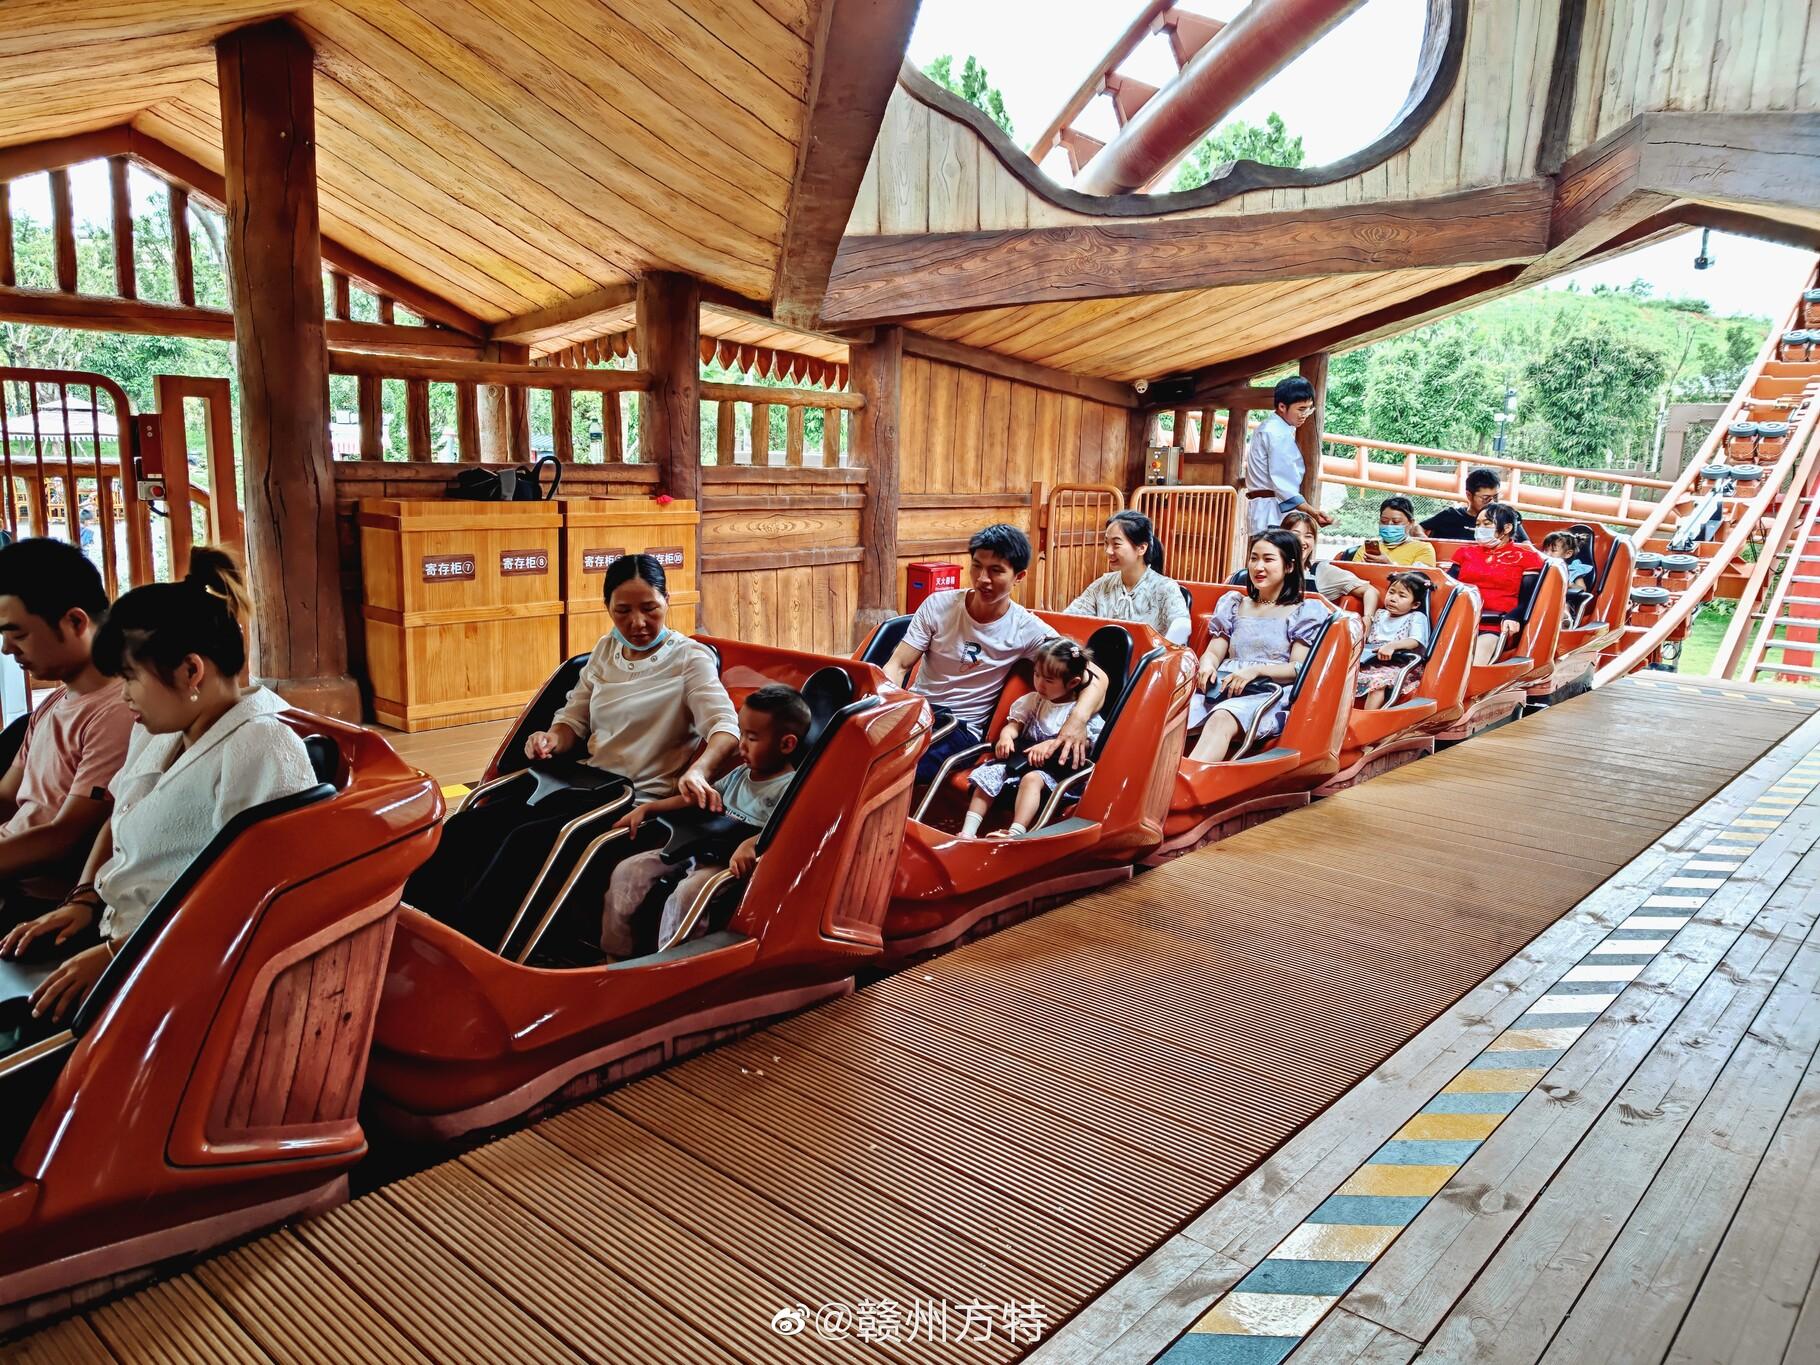 fantawild-theme-parks-81818000.jpg